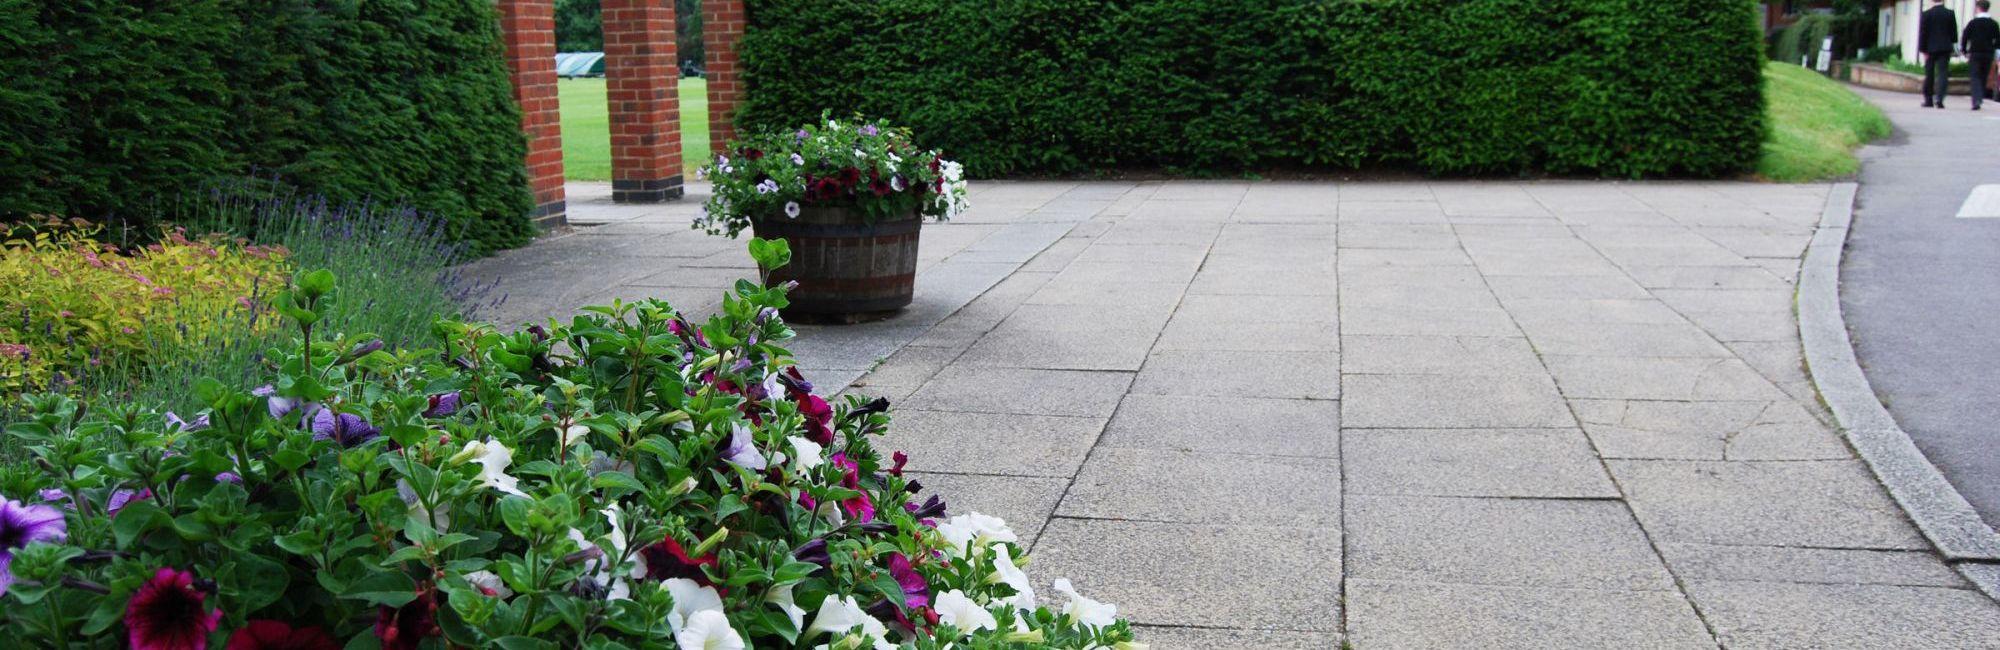 wycliffe garden with petunias